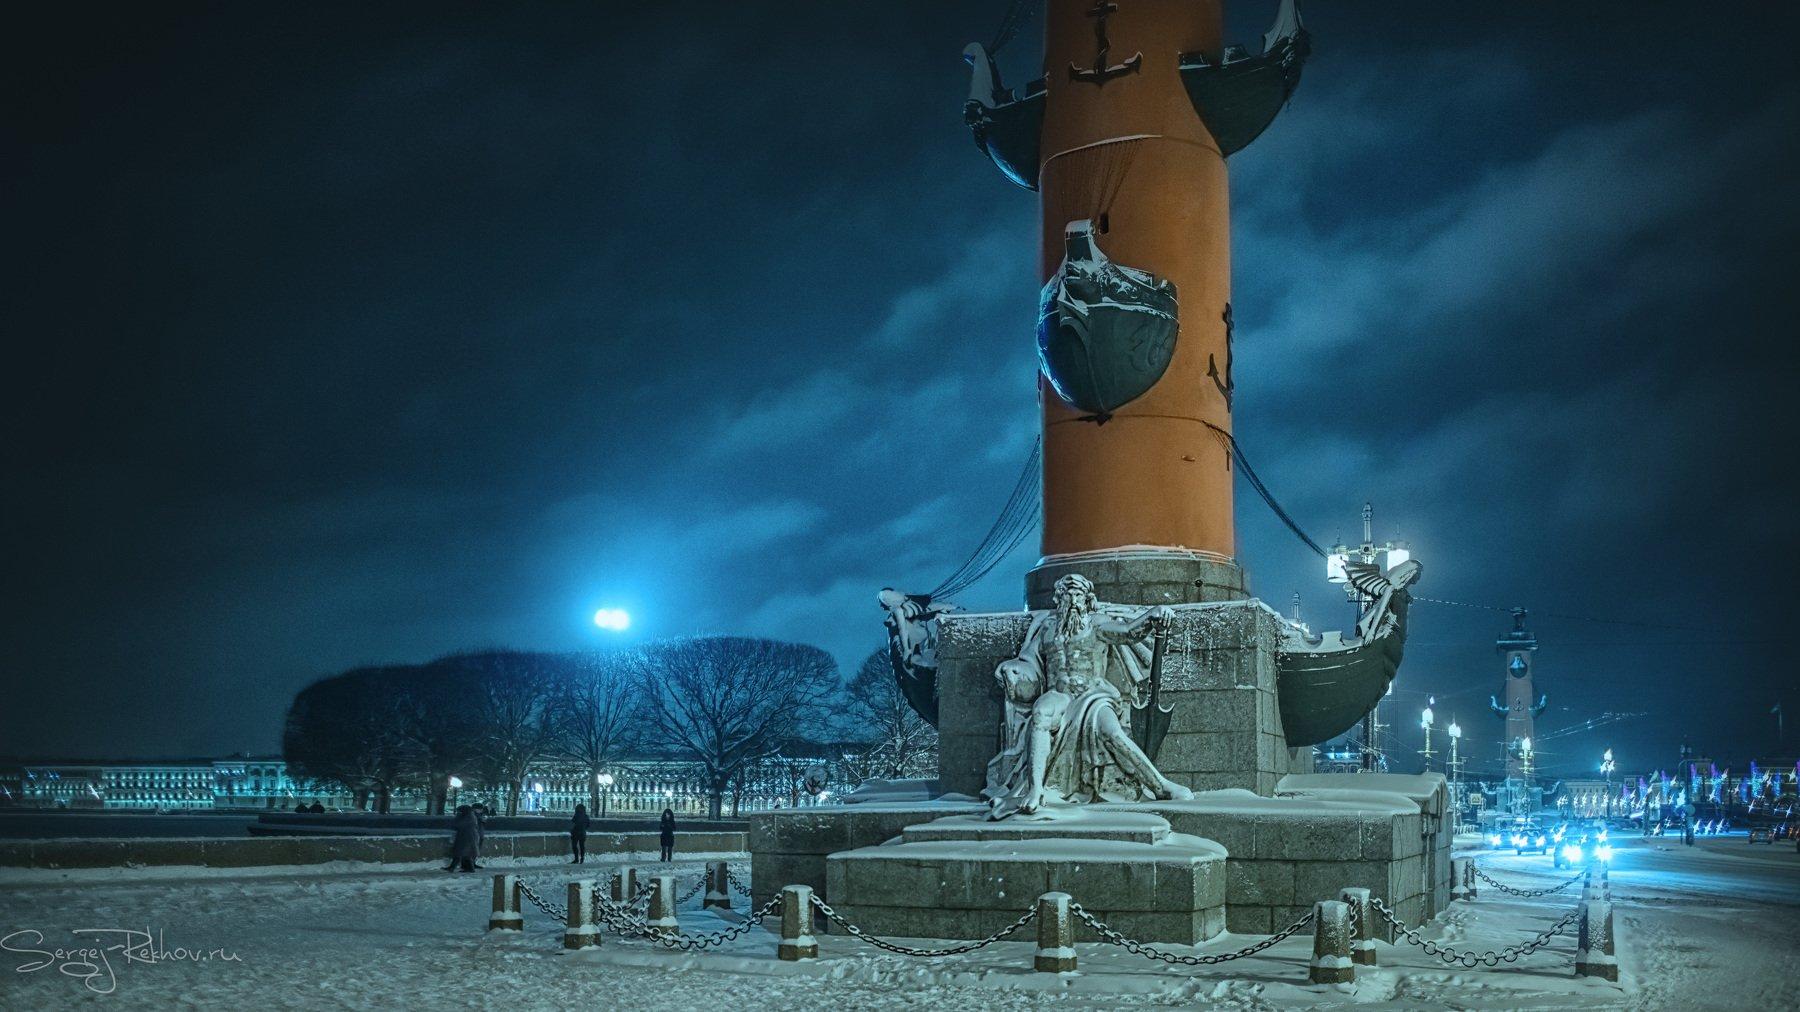 питер, санкт-петербург, зима, ночь, мороз, рехов, сергейрехов, rekhov, sergejrekhov, Сергей Рехов